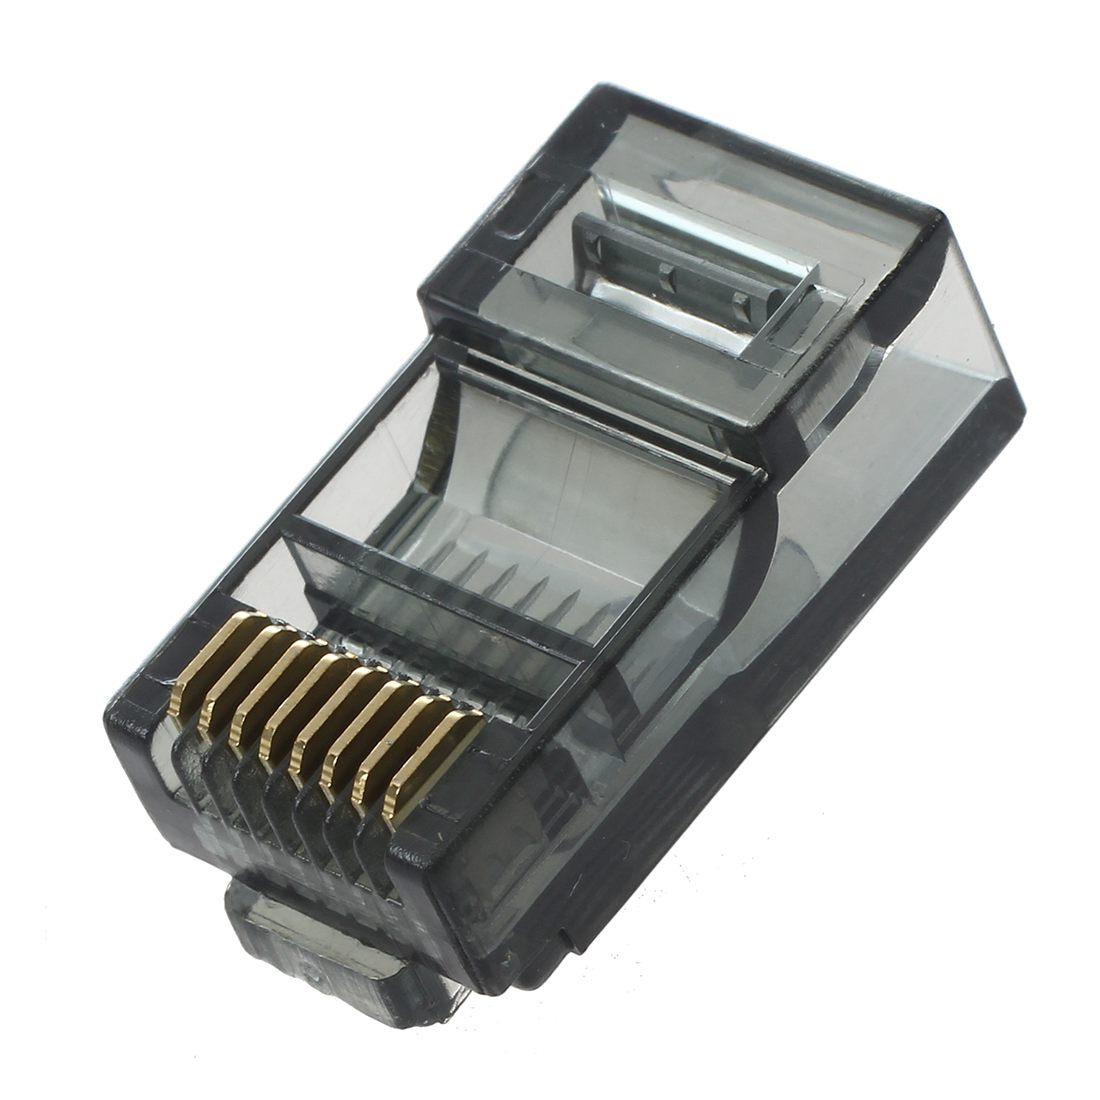 30 Pcs Black Housing 8P8C Cat5 CatE Modular Network Cable Plug RJ45 Connector